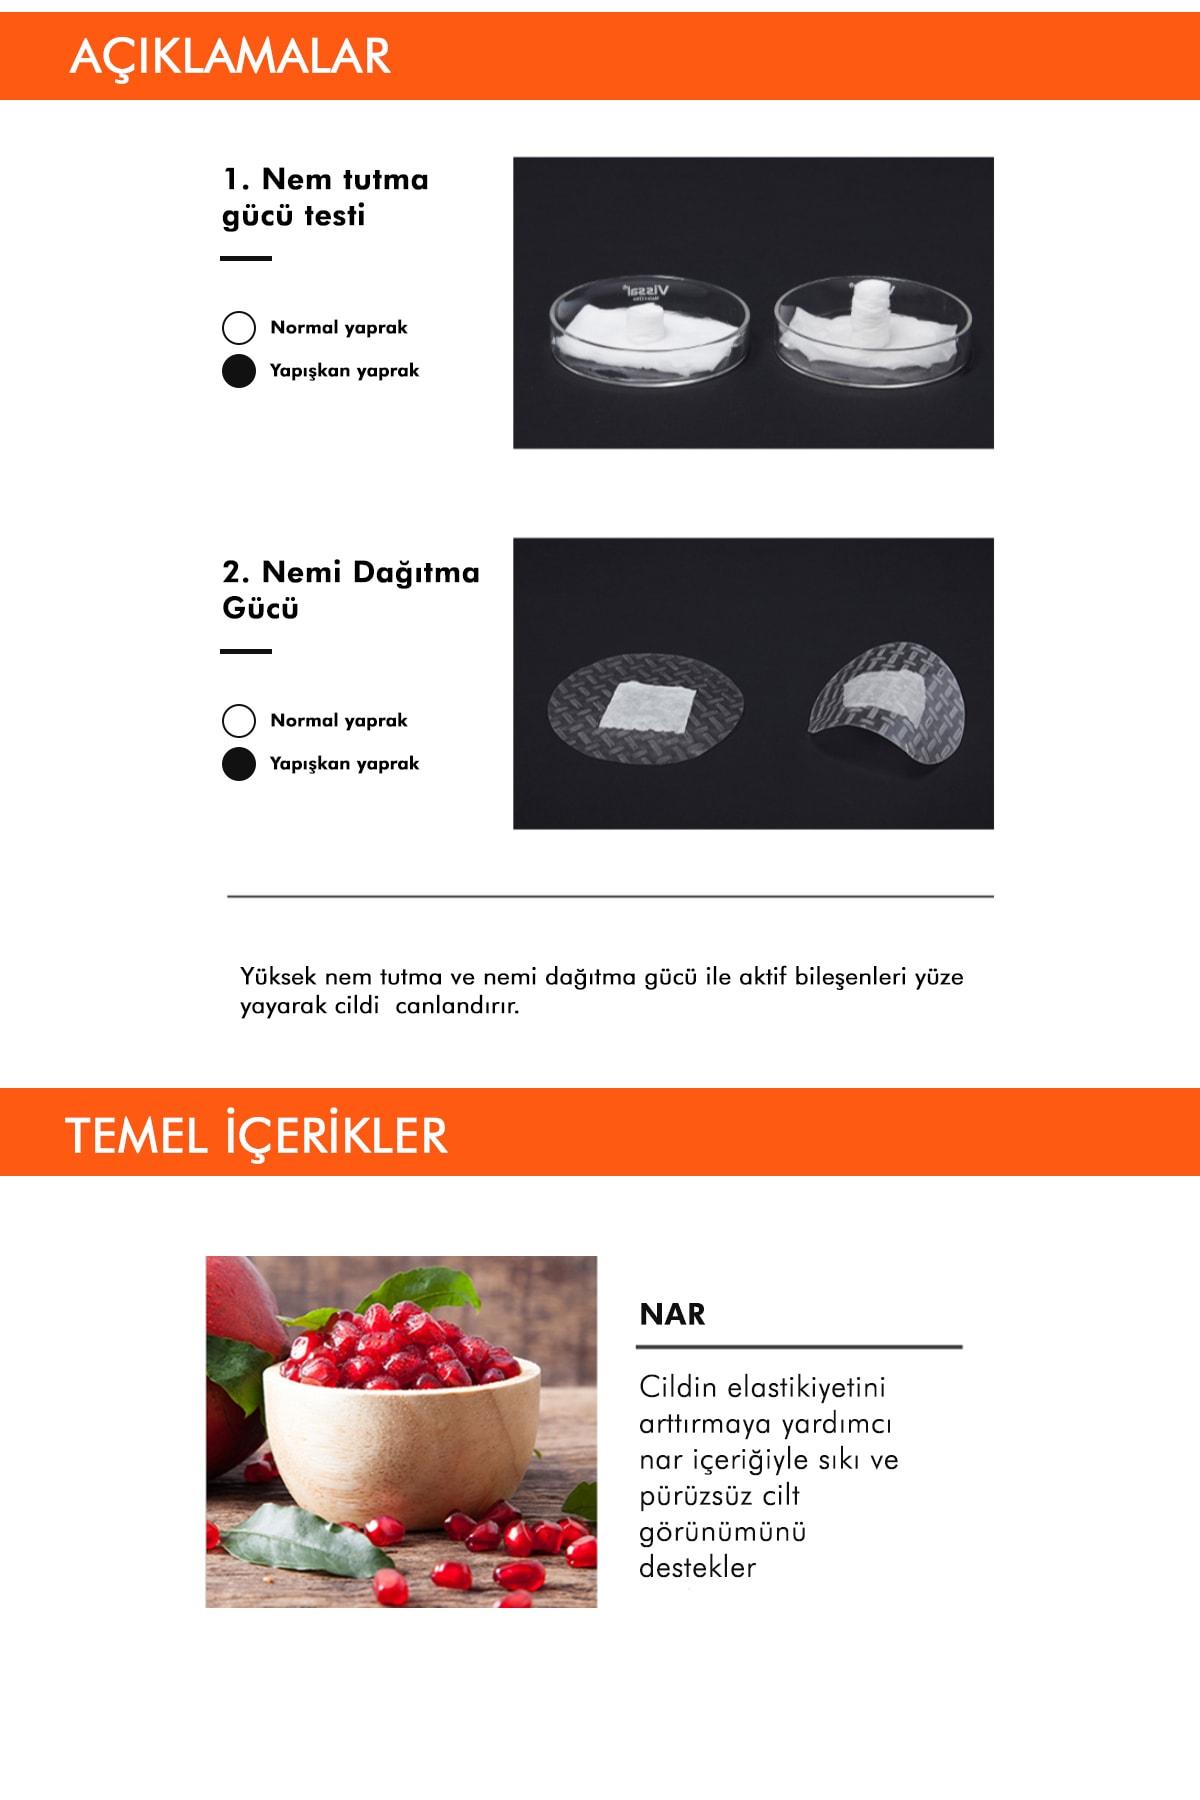 Missha Yaşlanma Karşıtı Nar Özlü Sıkılaştırıcı Yaprak Maske (1ad) Airy Fit Sheet Mask Pomegranate 3